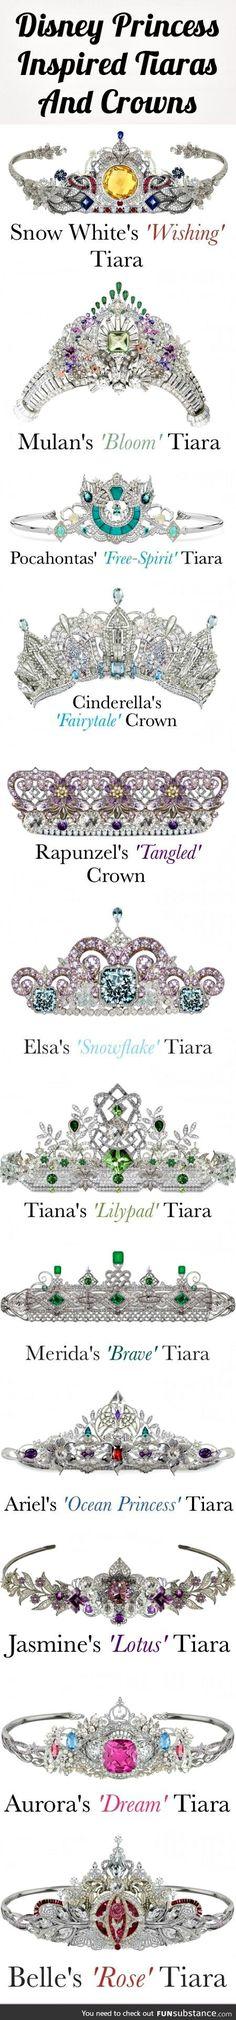 12 Disney Princess Tiaras And Crowns…All Set With Beautiful Diamonds, Gems Precious Stones. - I'll take the Cinderella, Rapunzel and of course Ariel tiara, please!